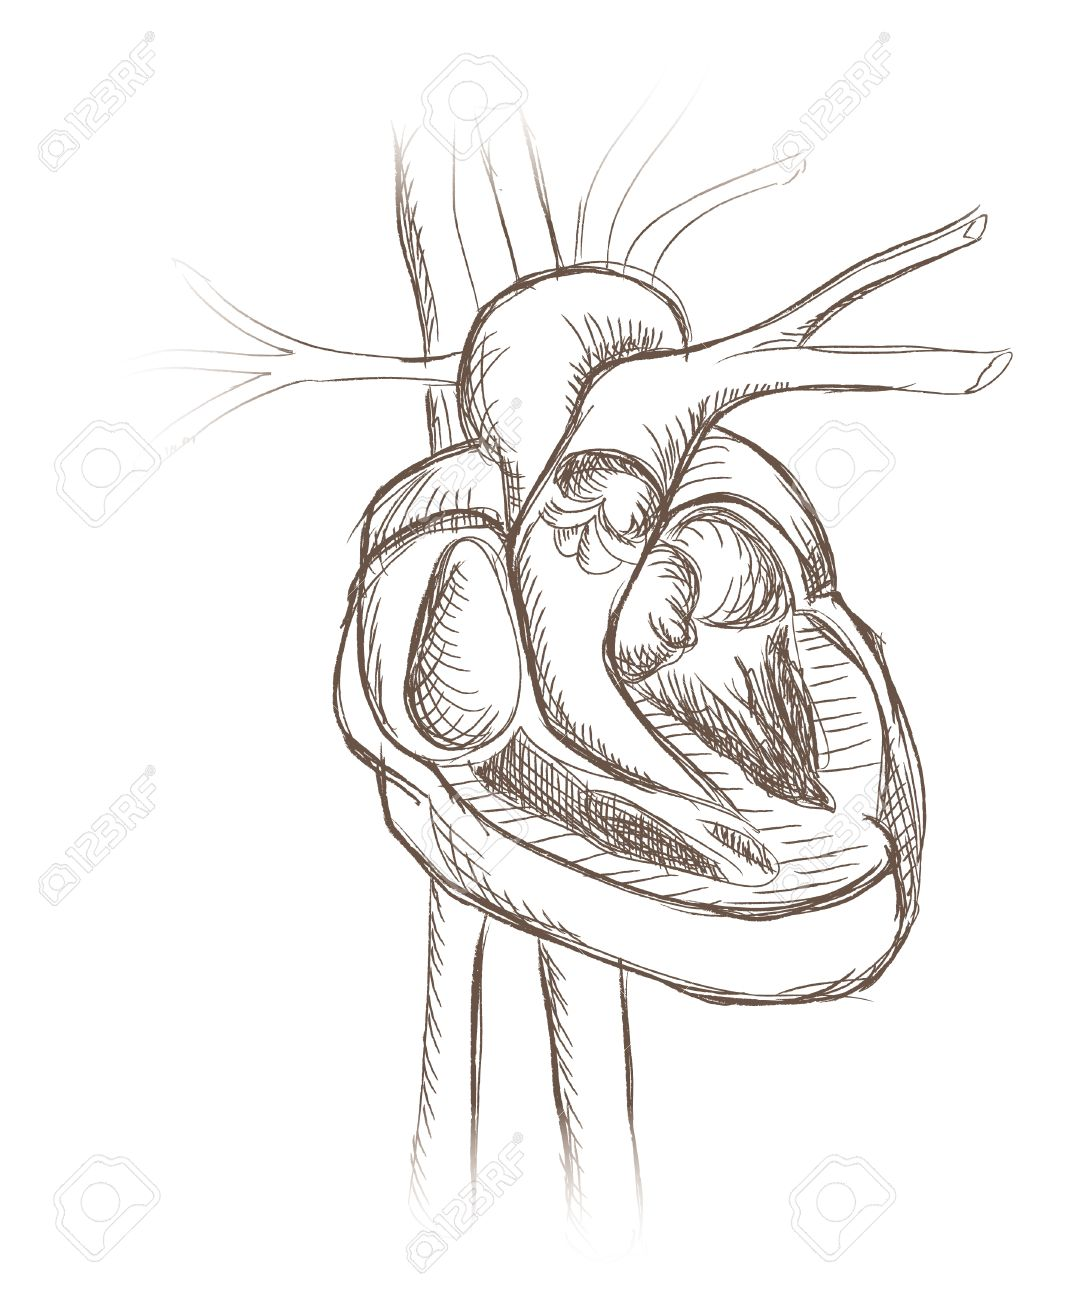 1085x1300 Human Heart Anatomy From Healthy Body, Vector Illustration